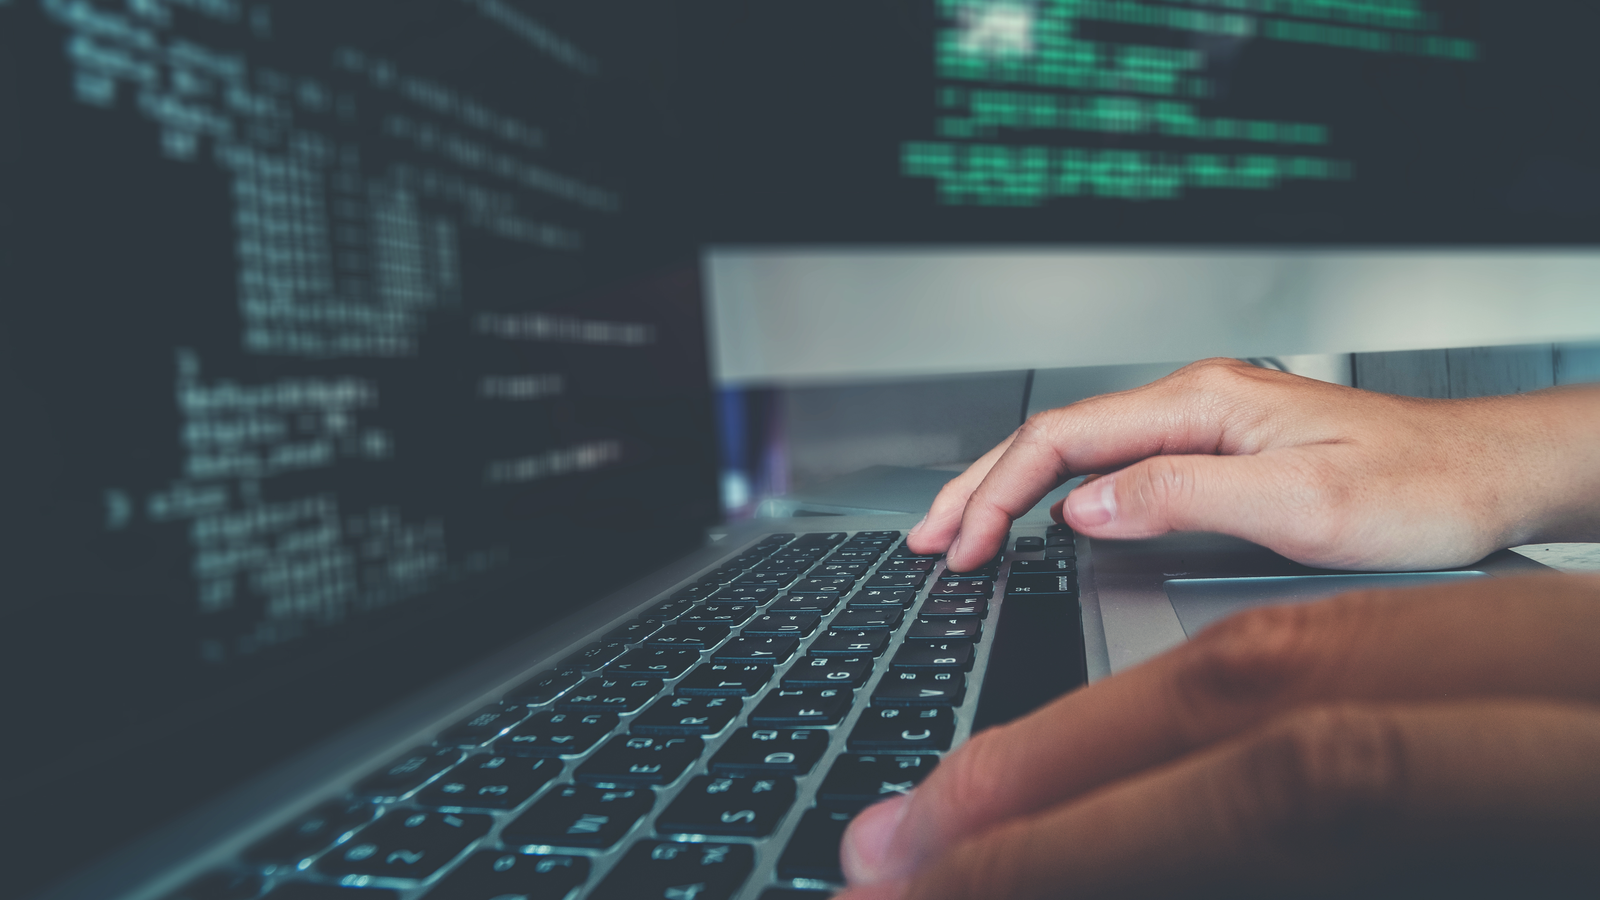 Developer programmer typing code for a website in an office